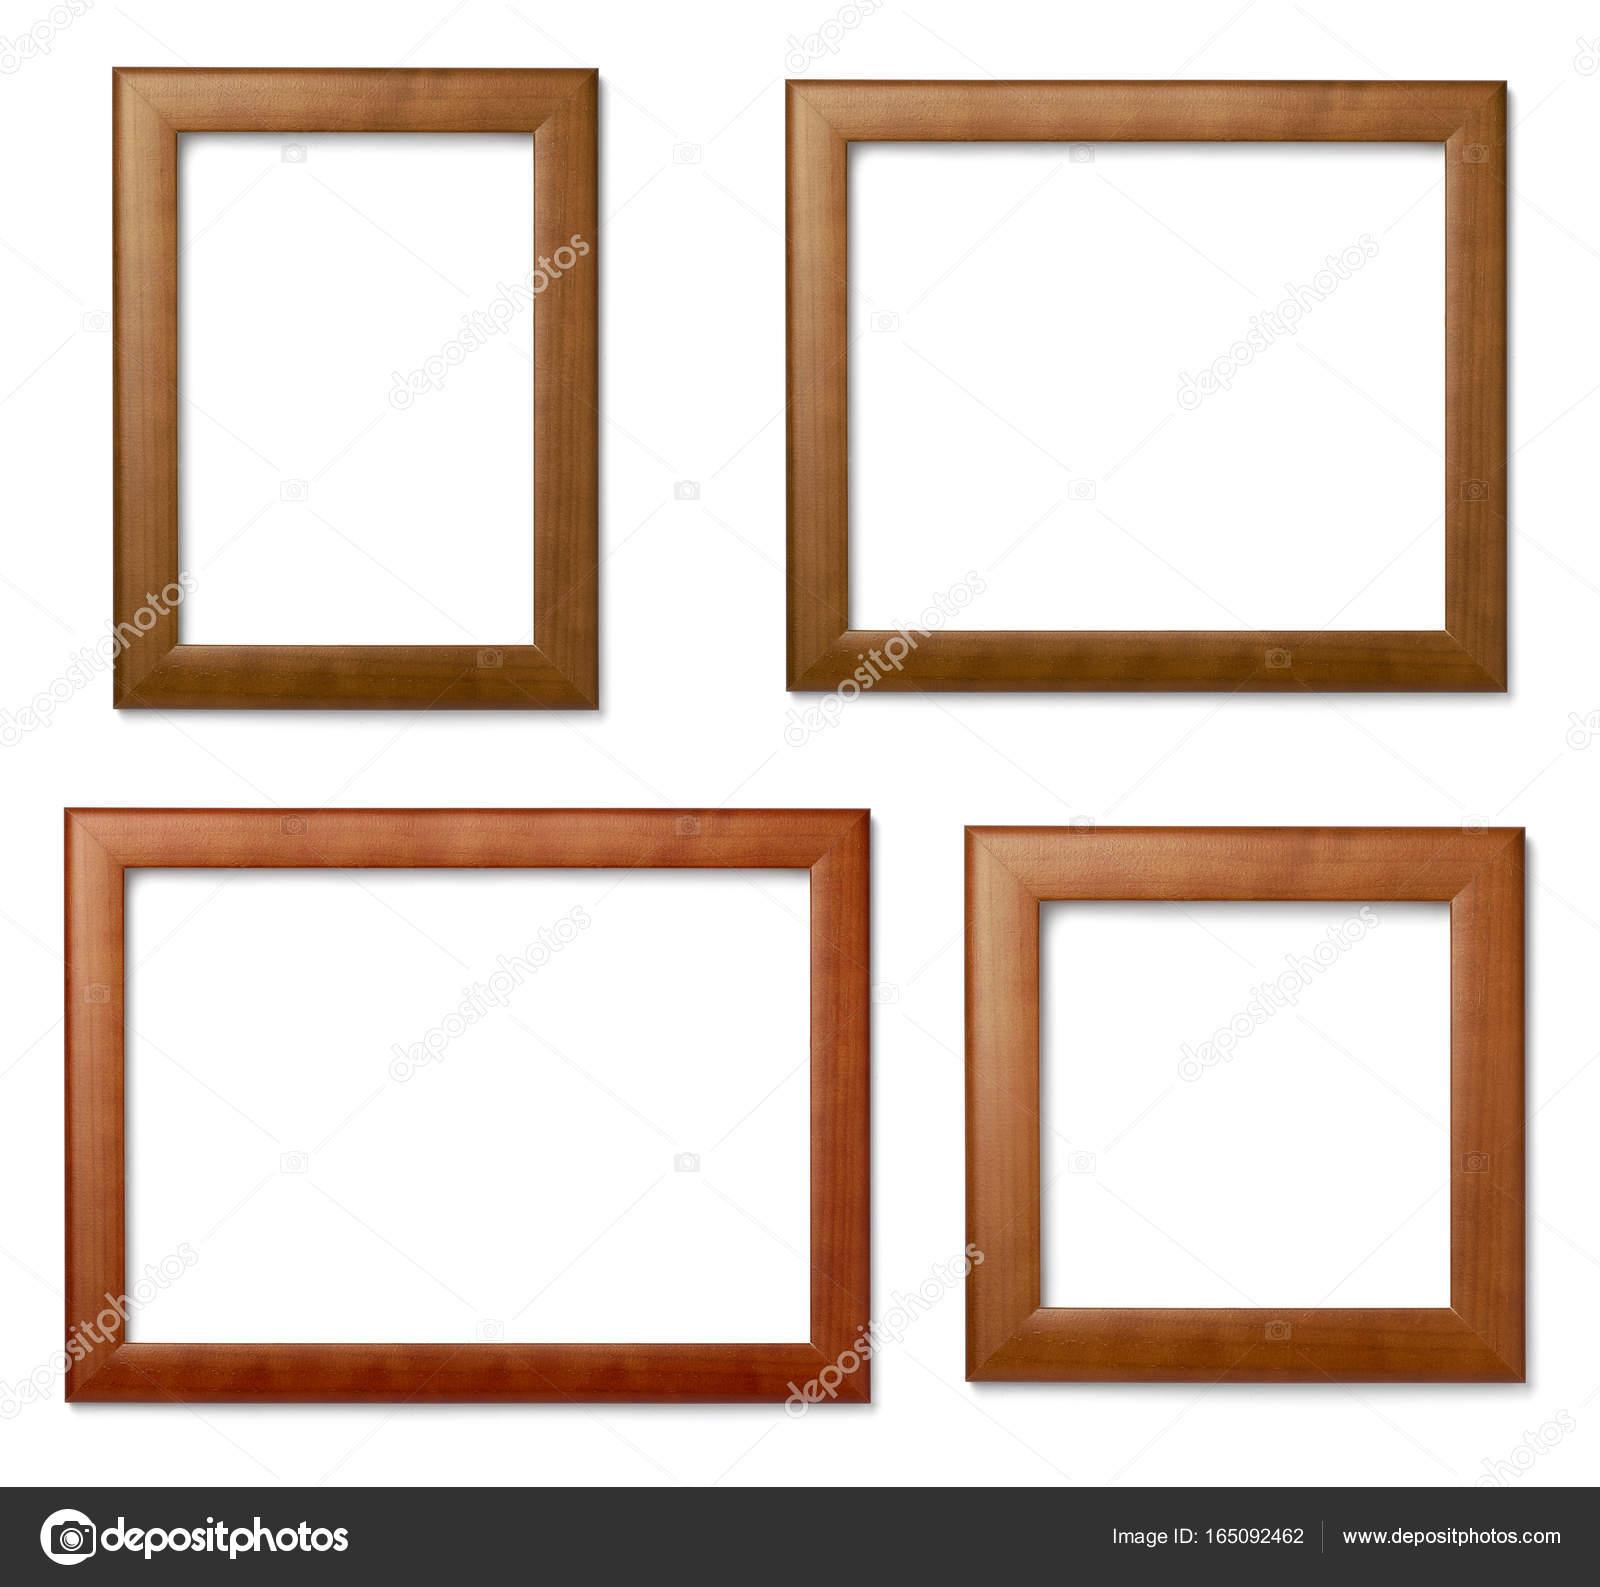 Vintage-Rahmen Holz Hintergrundbild — Stockfoto © PicsFive #165092462